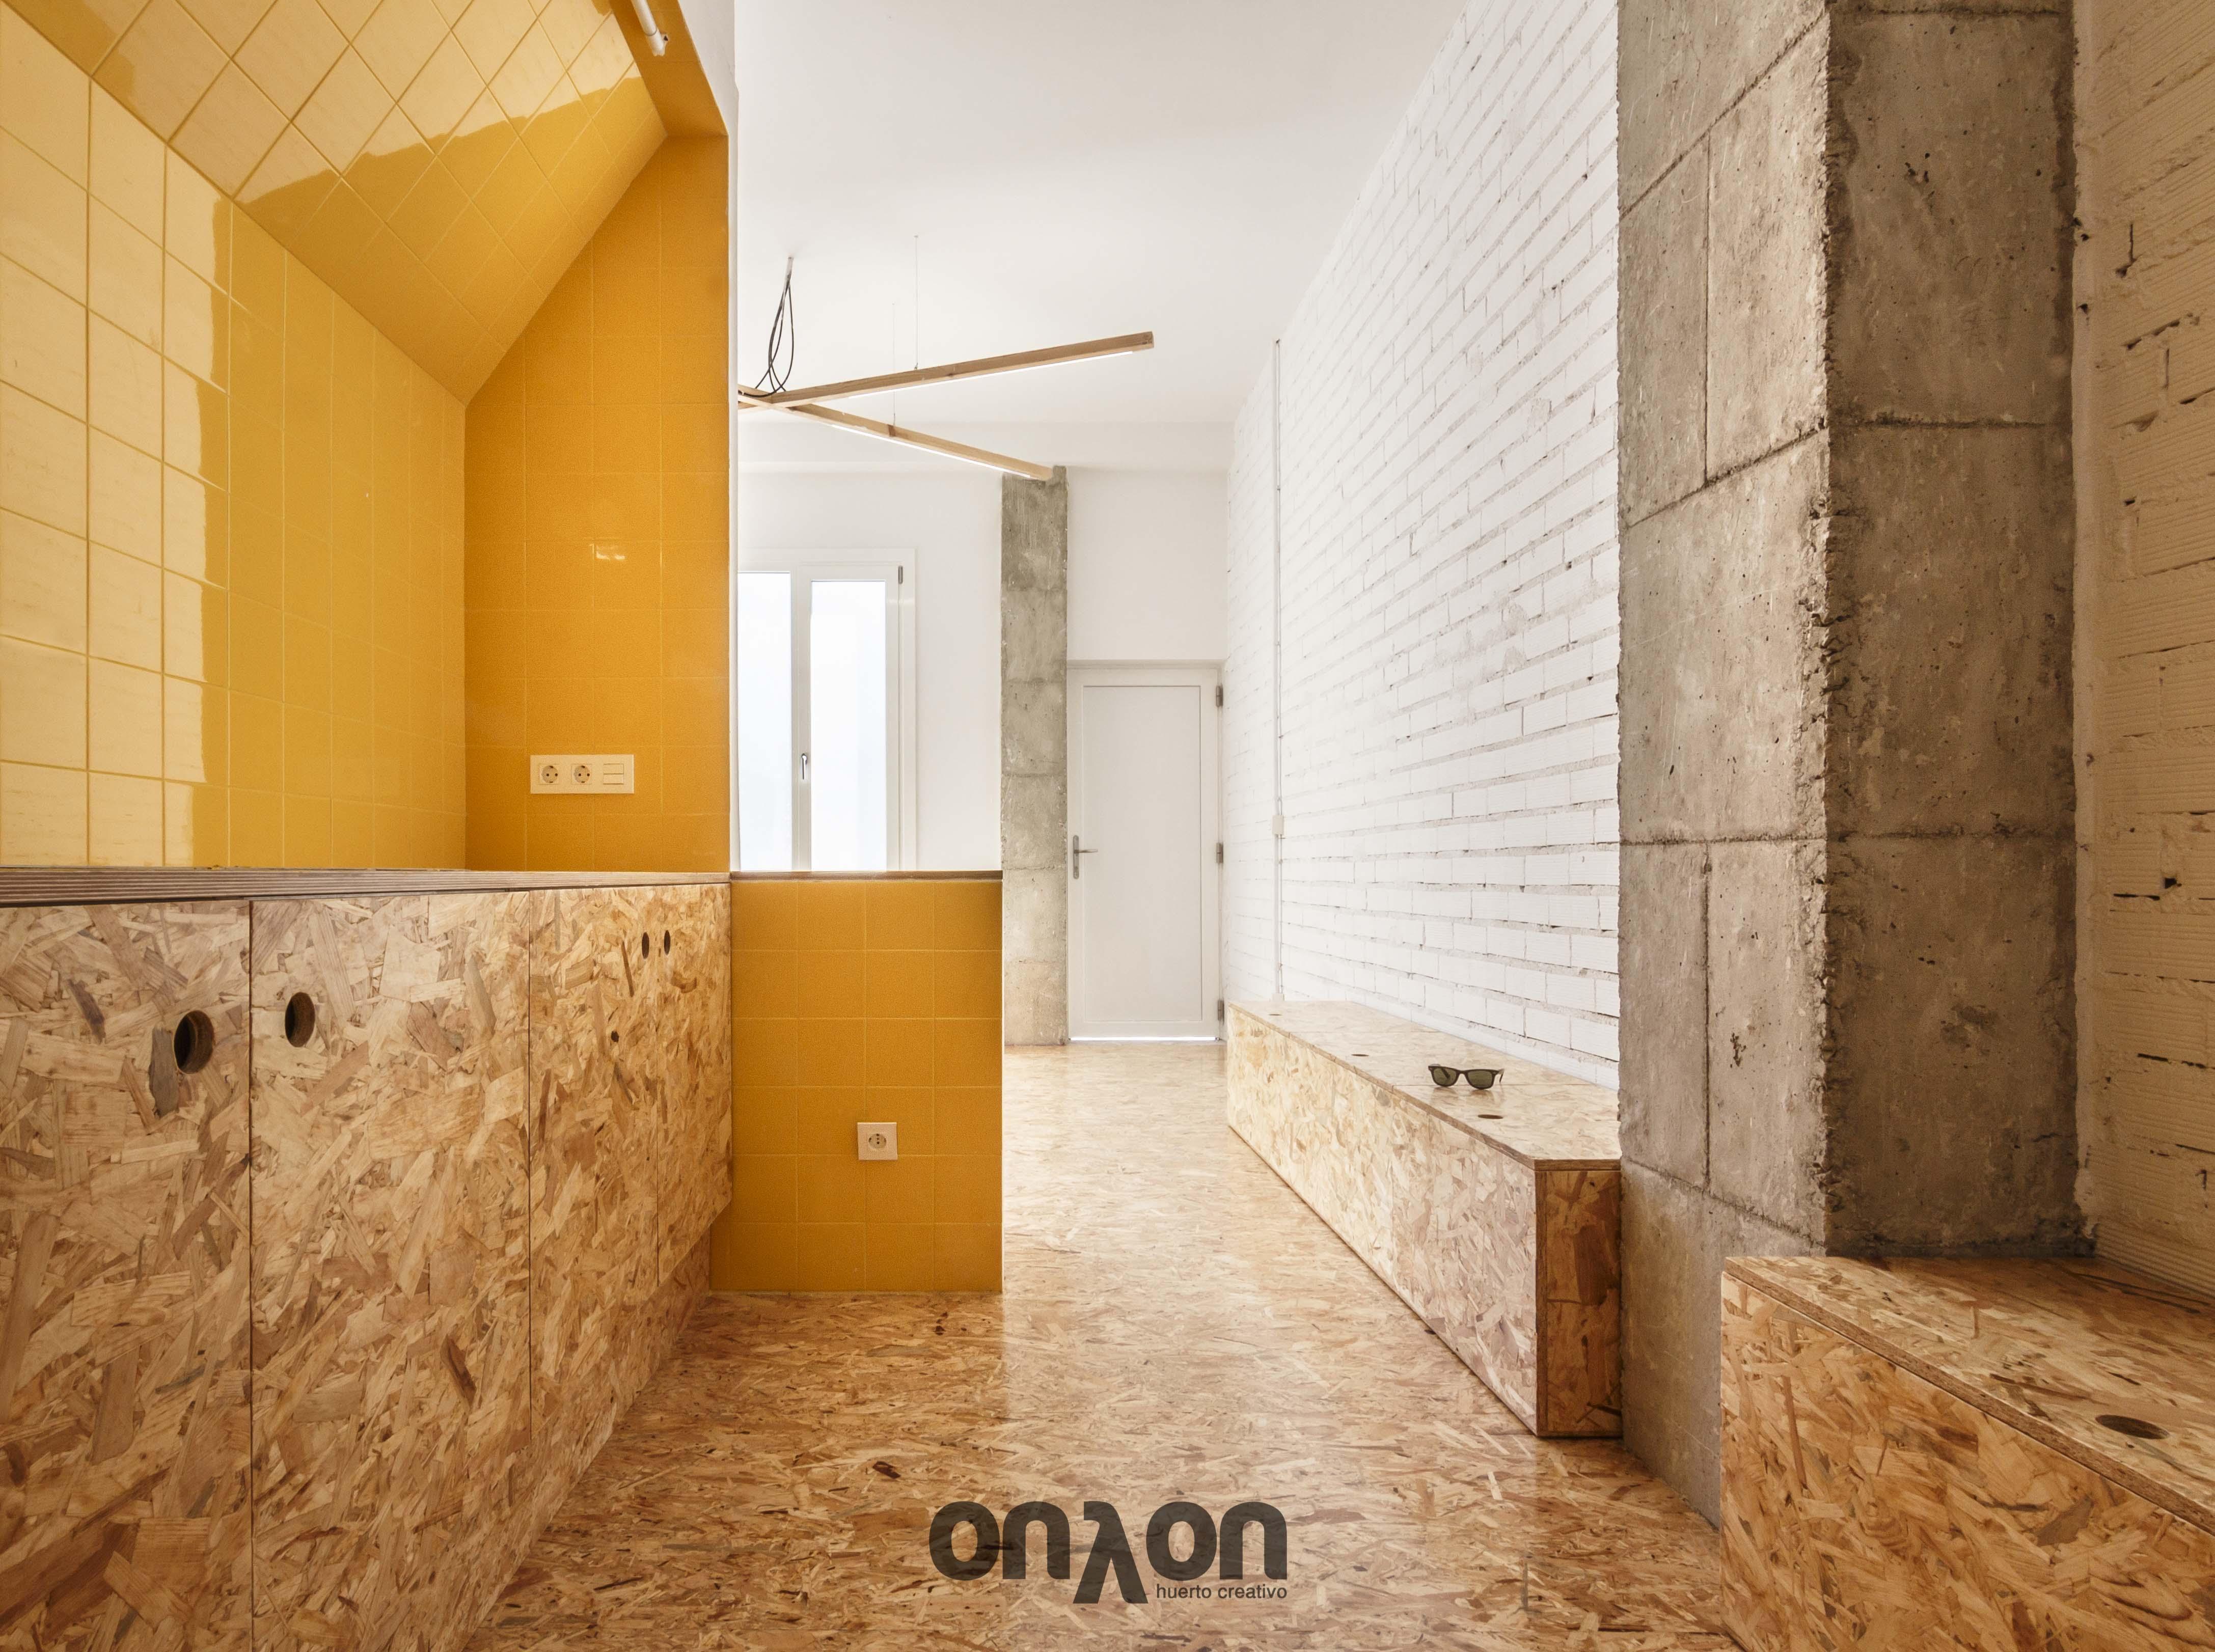 onyon-basarte-baja-sello9